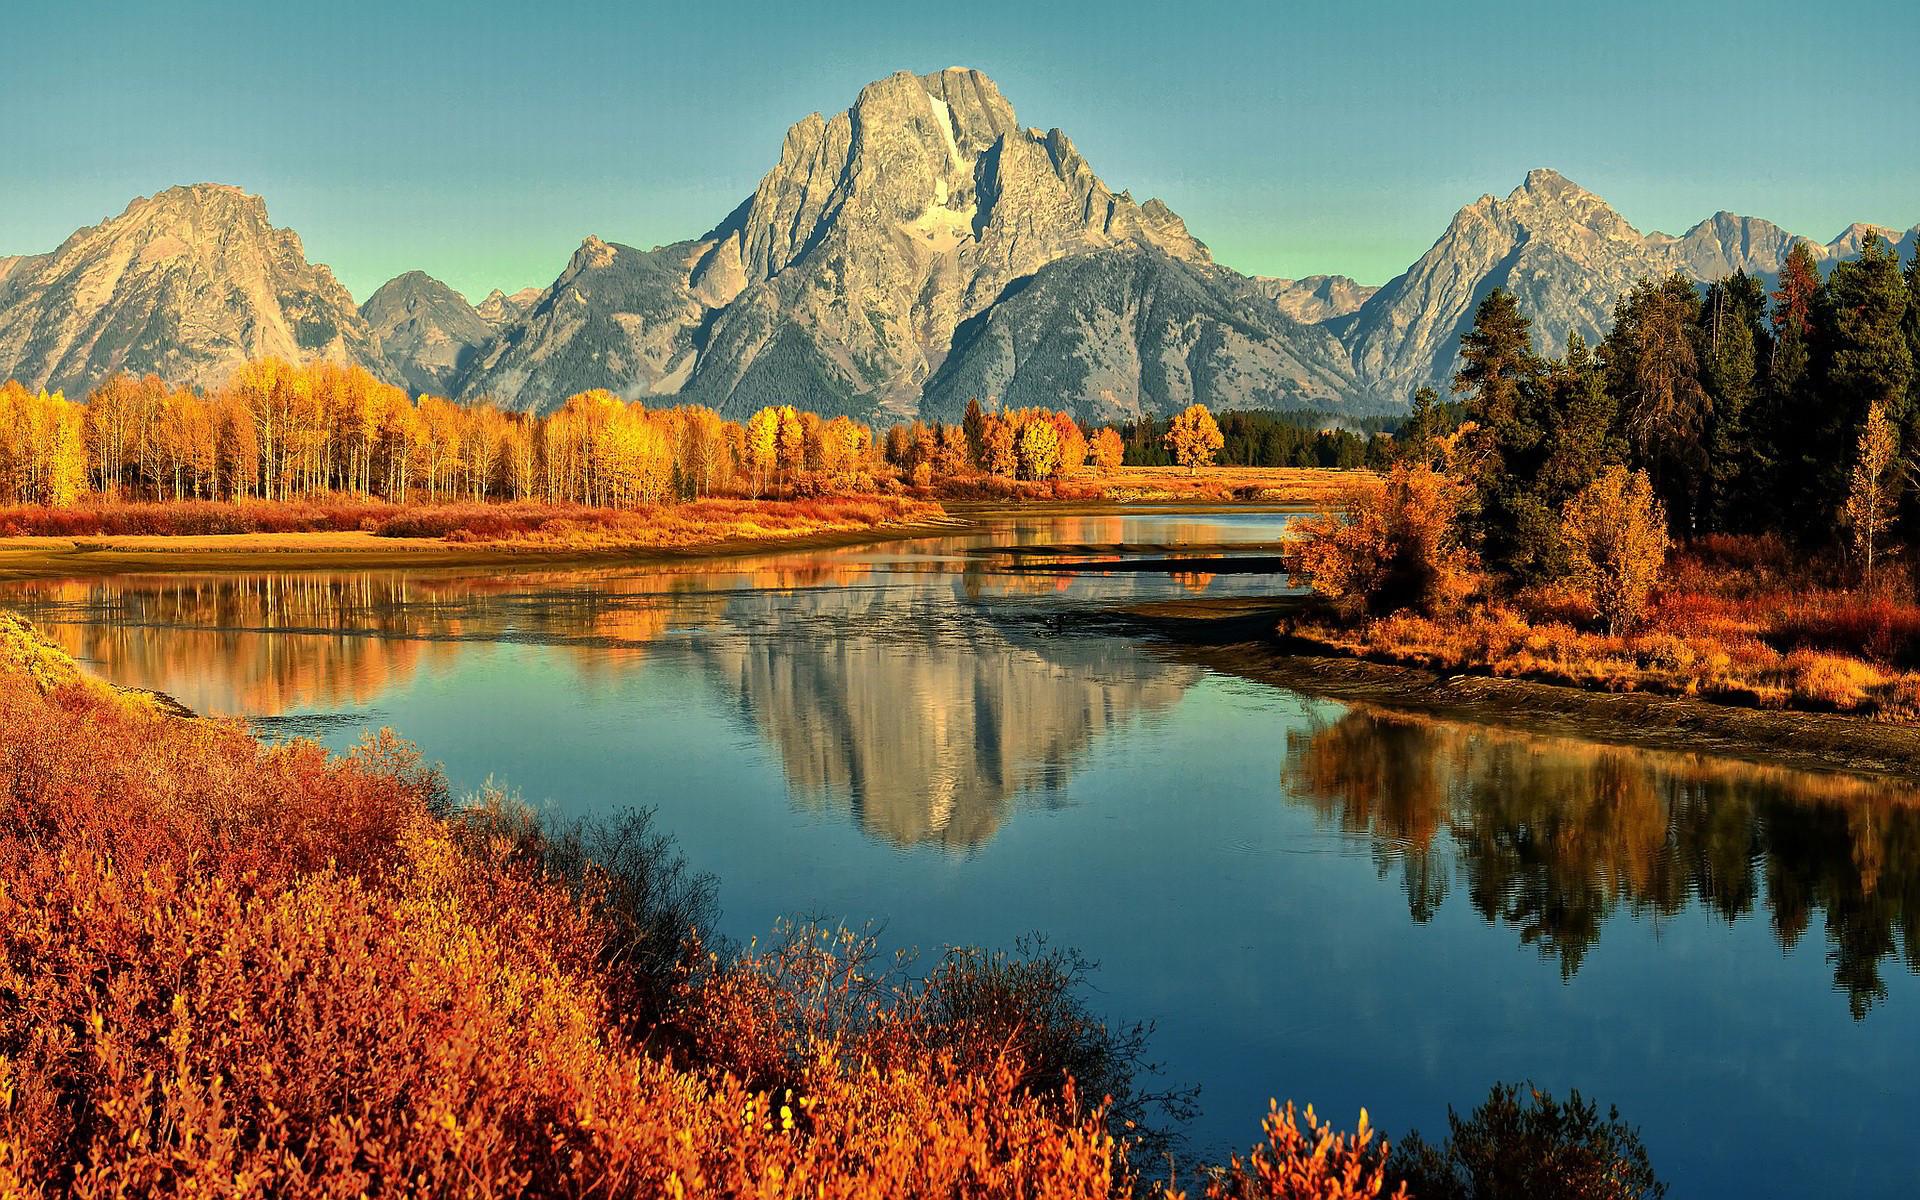 Mountain lake in Autumn Nature HD desktop wallpaper, Tree wallpaper,  Mountain wallpaper, Lake wallpaper, Autumn wallpaper – Nature no.